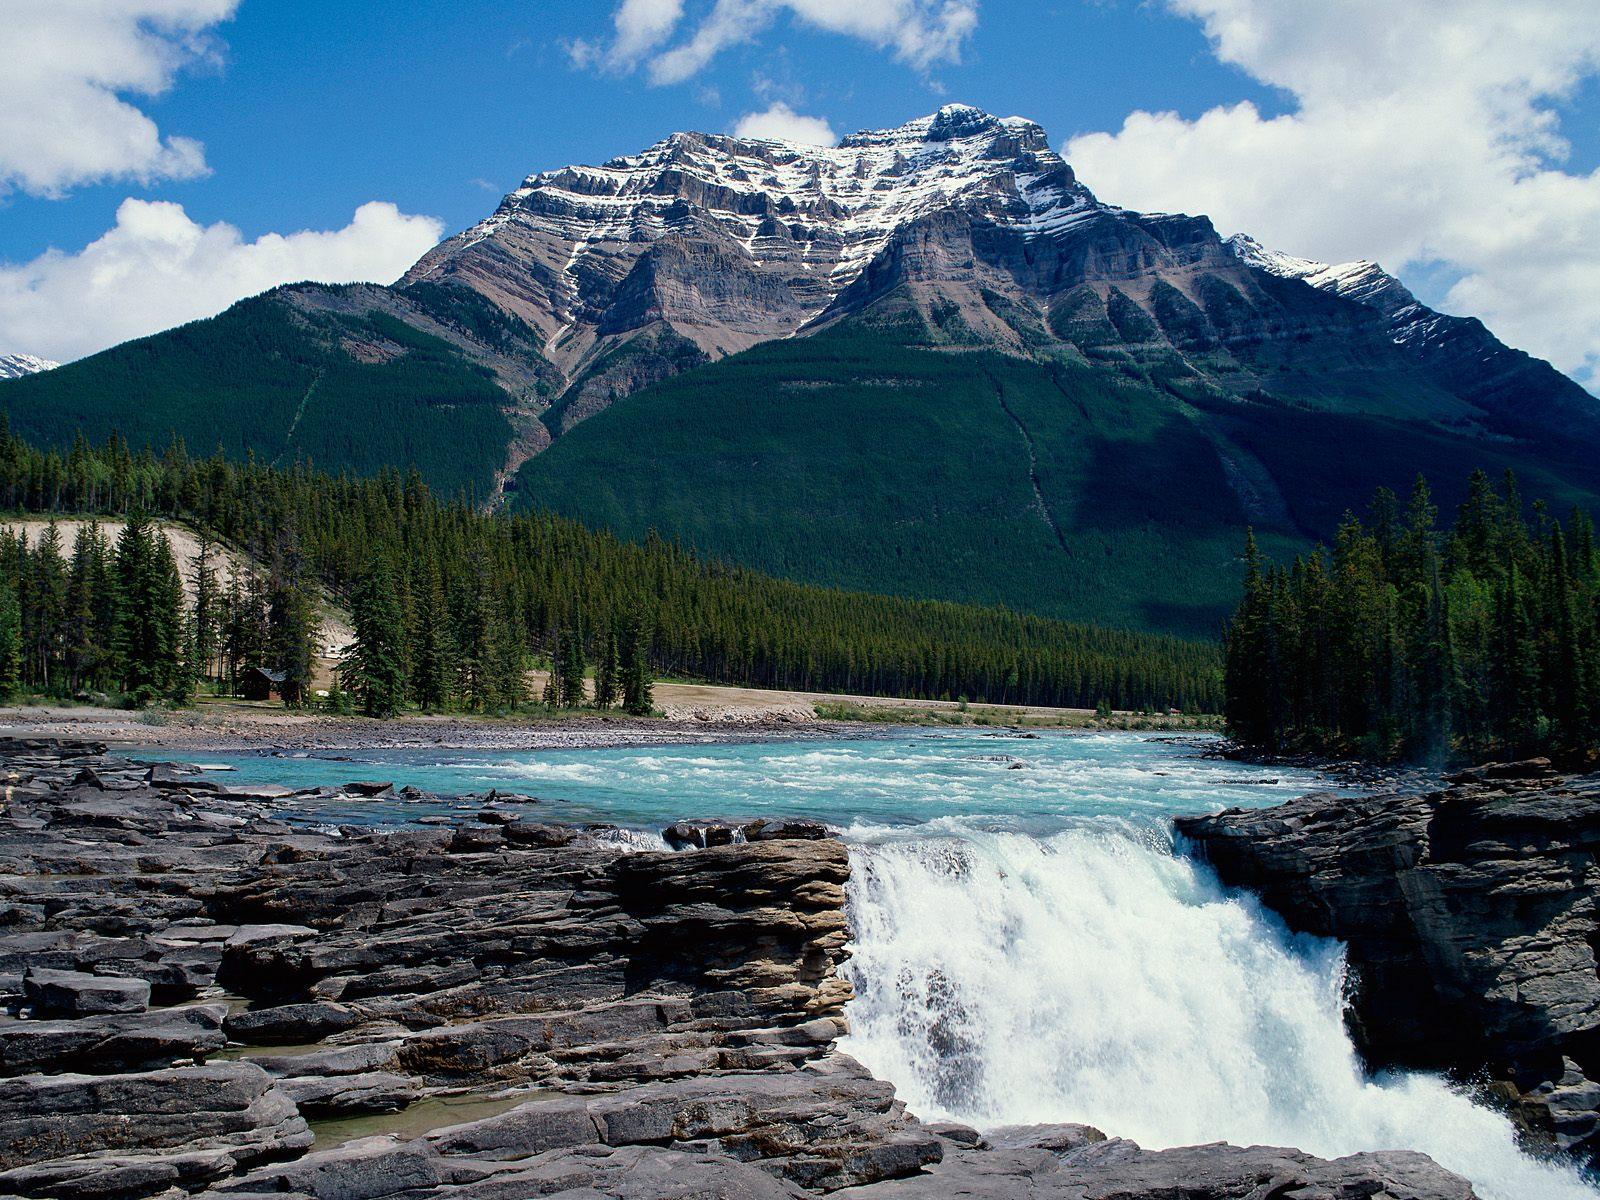 nationalpark alberta kanada - photo #16